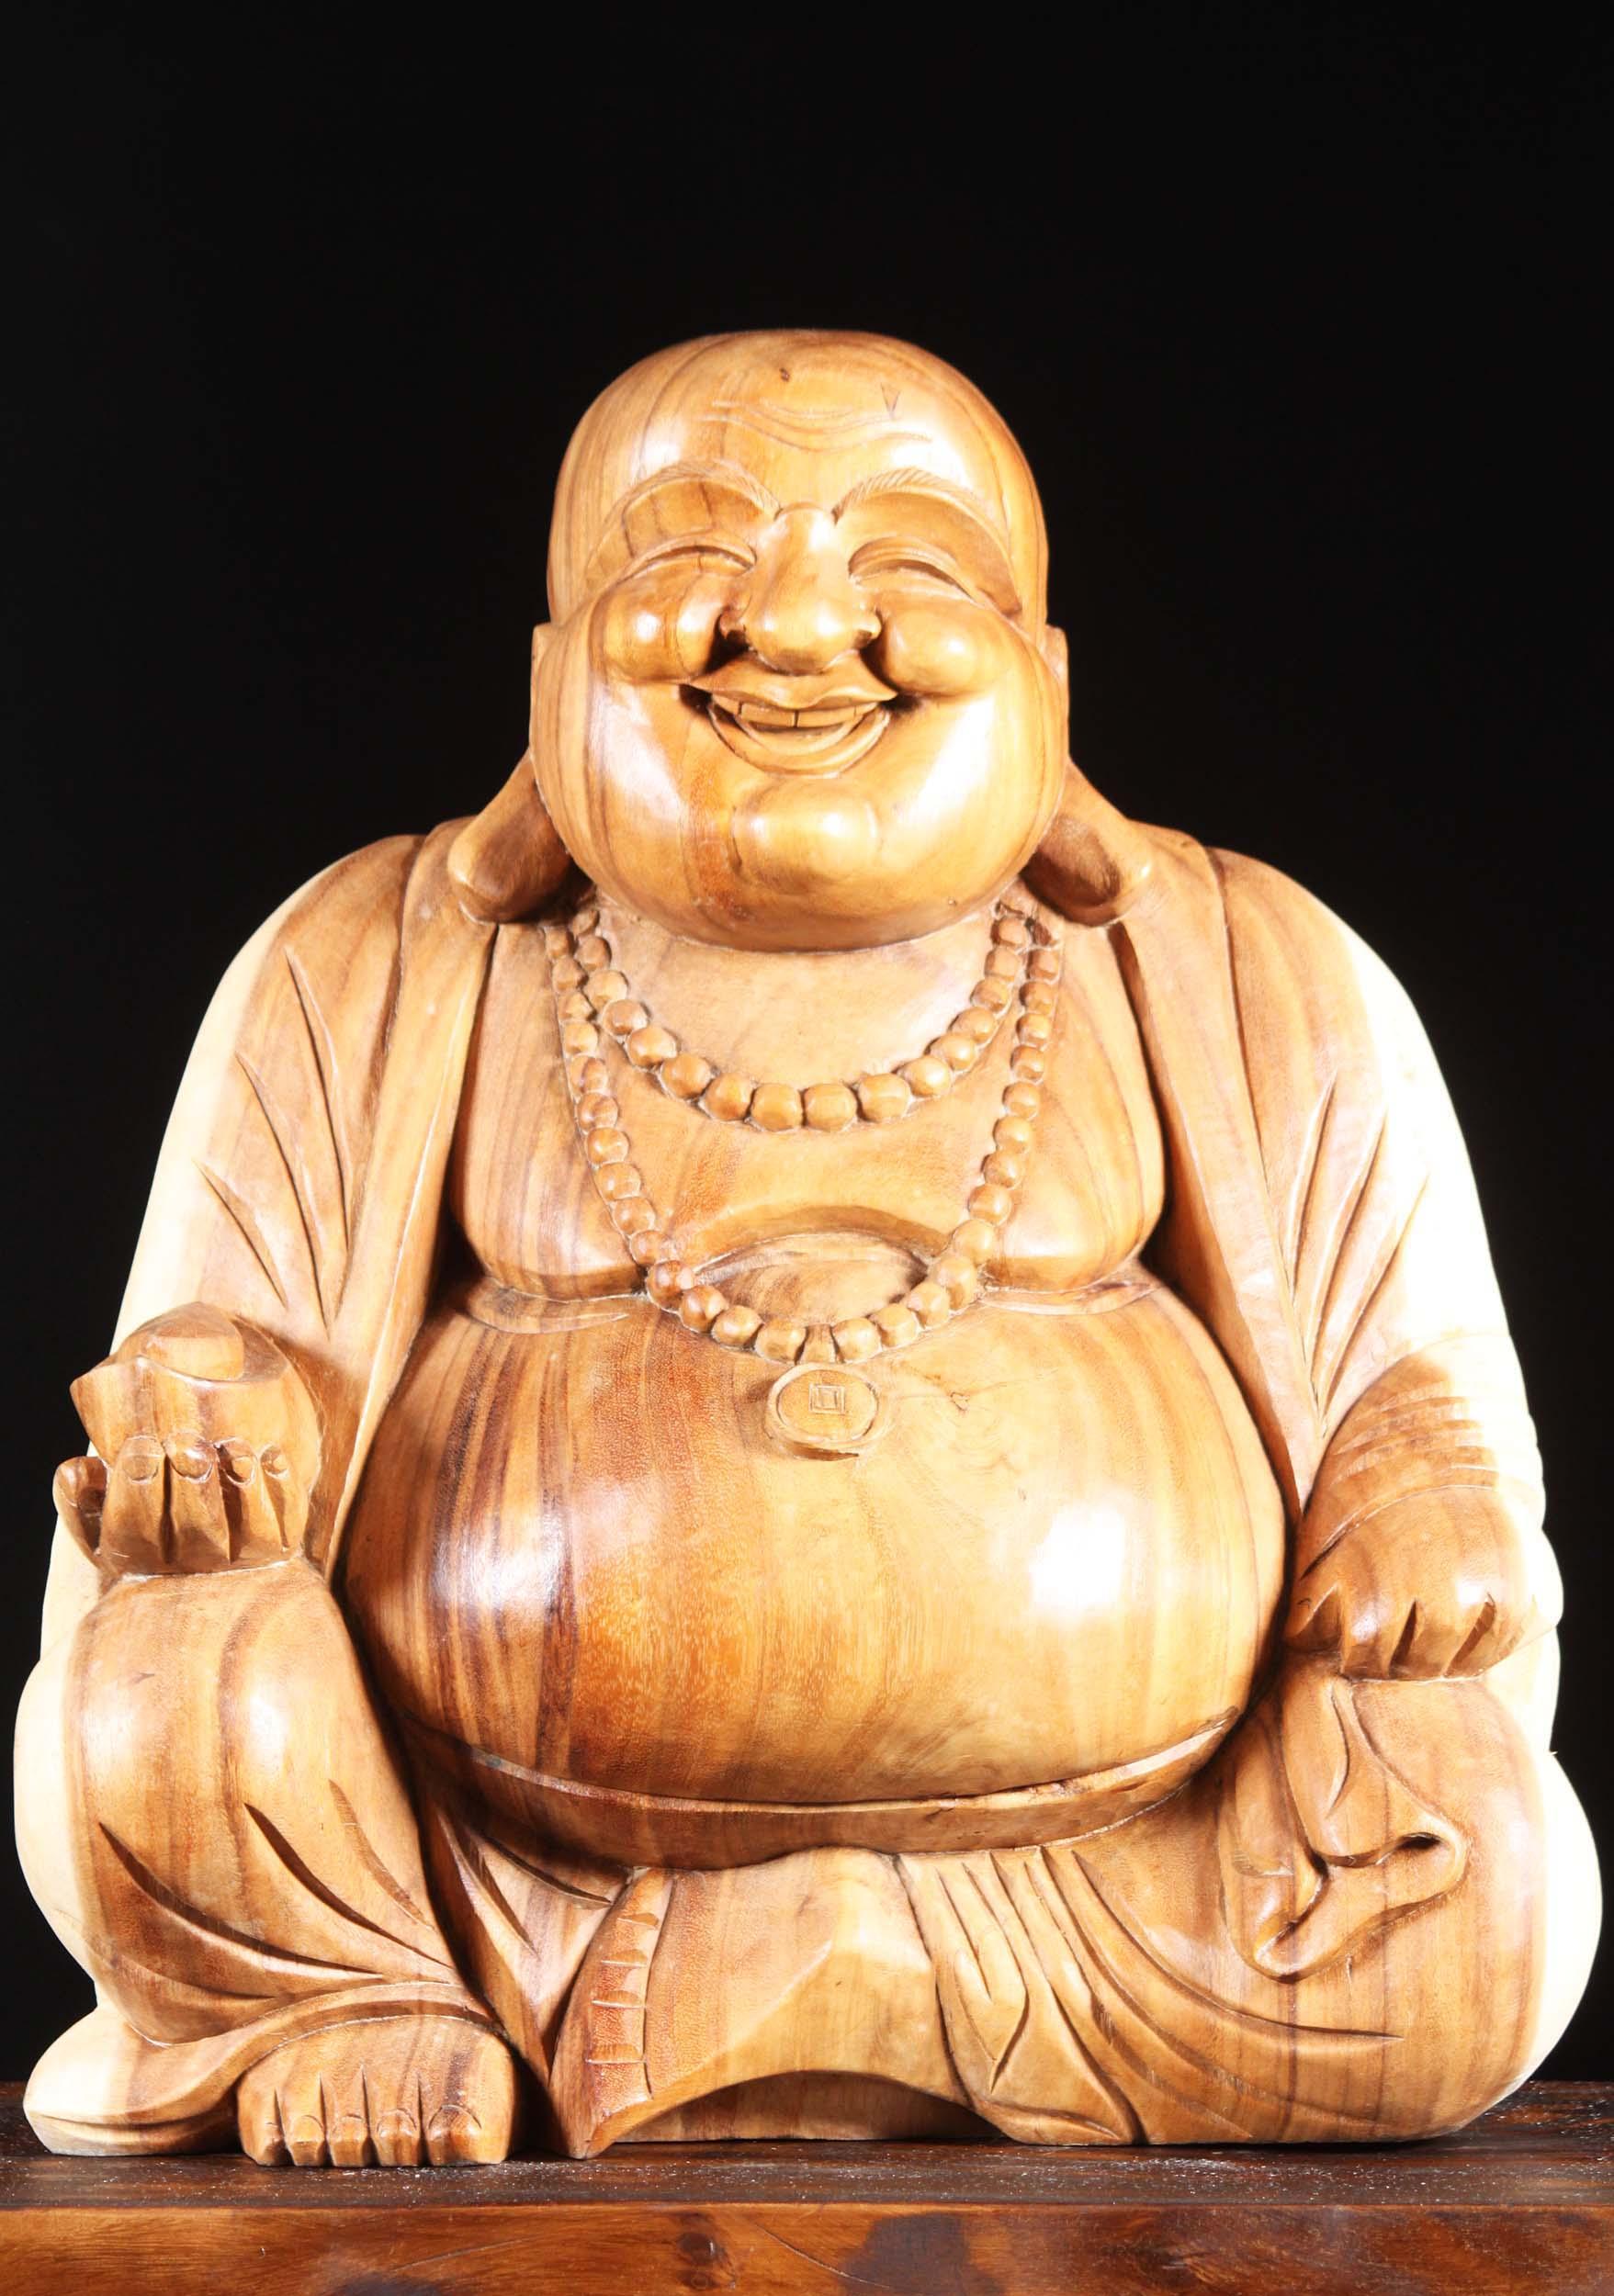 Wood Buddha Statues, Wooden Buddha Sculpture   Hindu Gods & Buddha ...